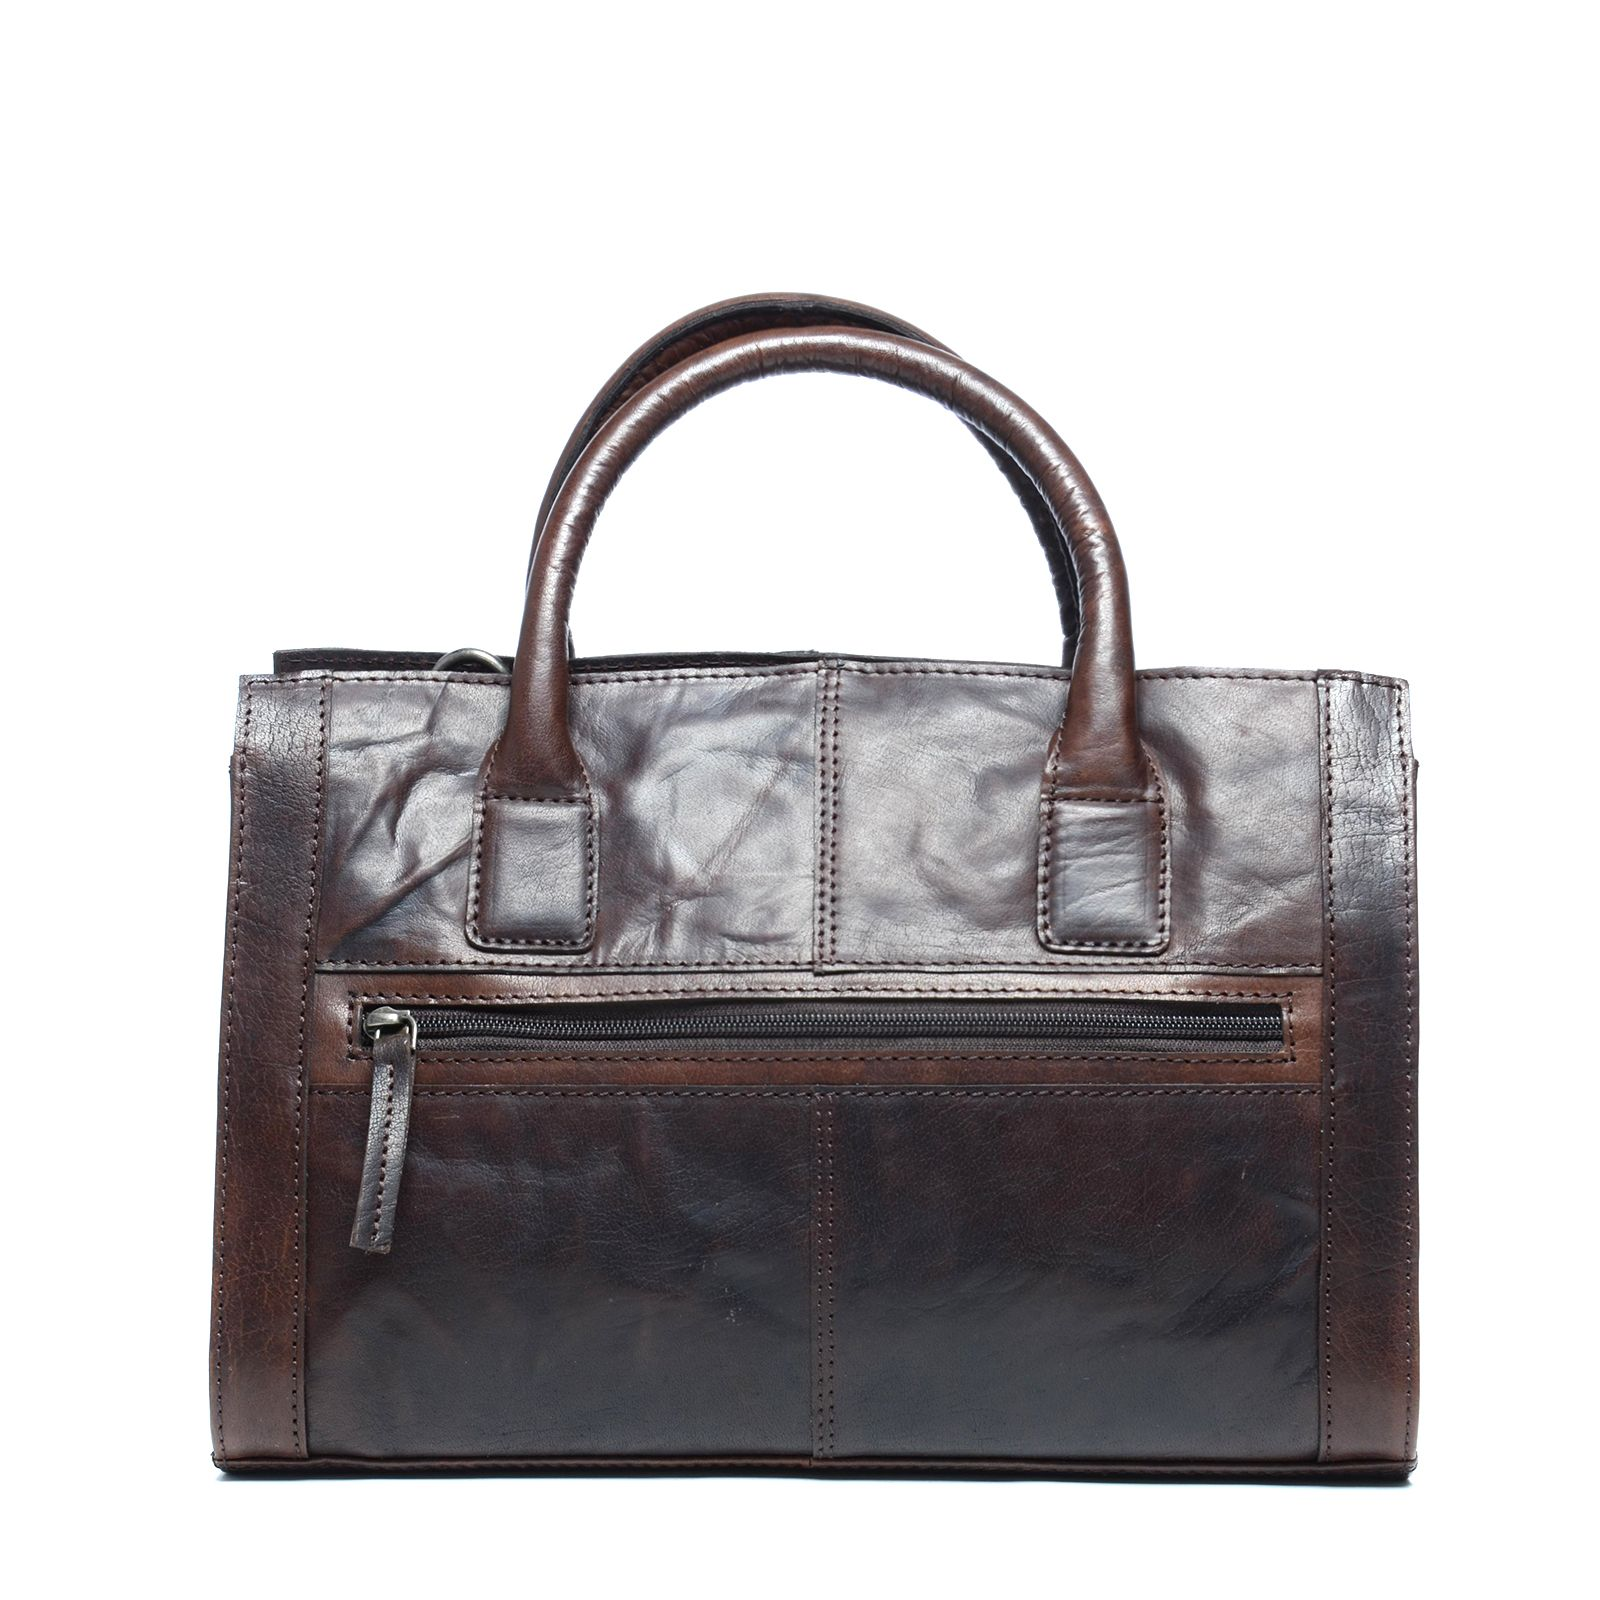 Zalando Bruine Tassen : Bruine handtas met rits tassen manfield